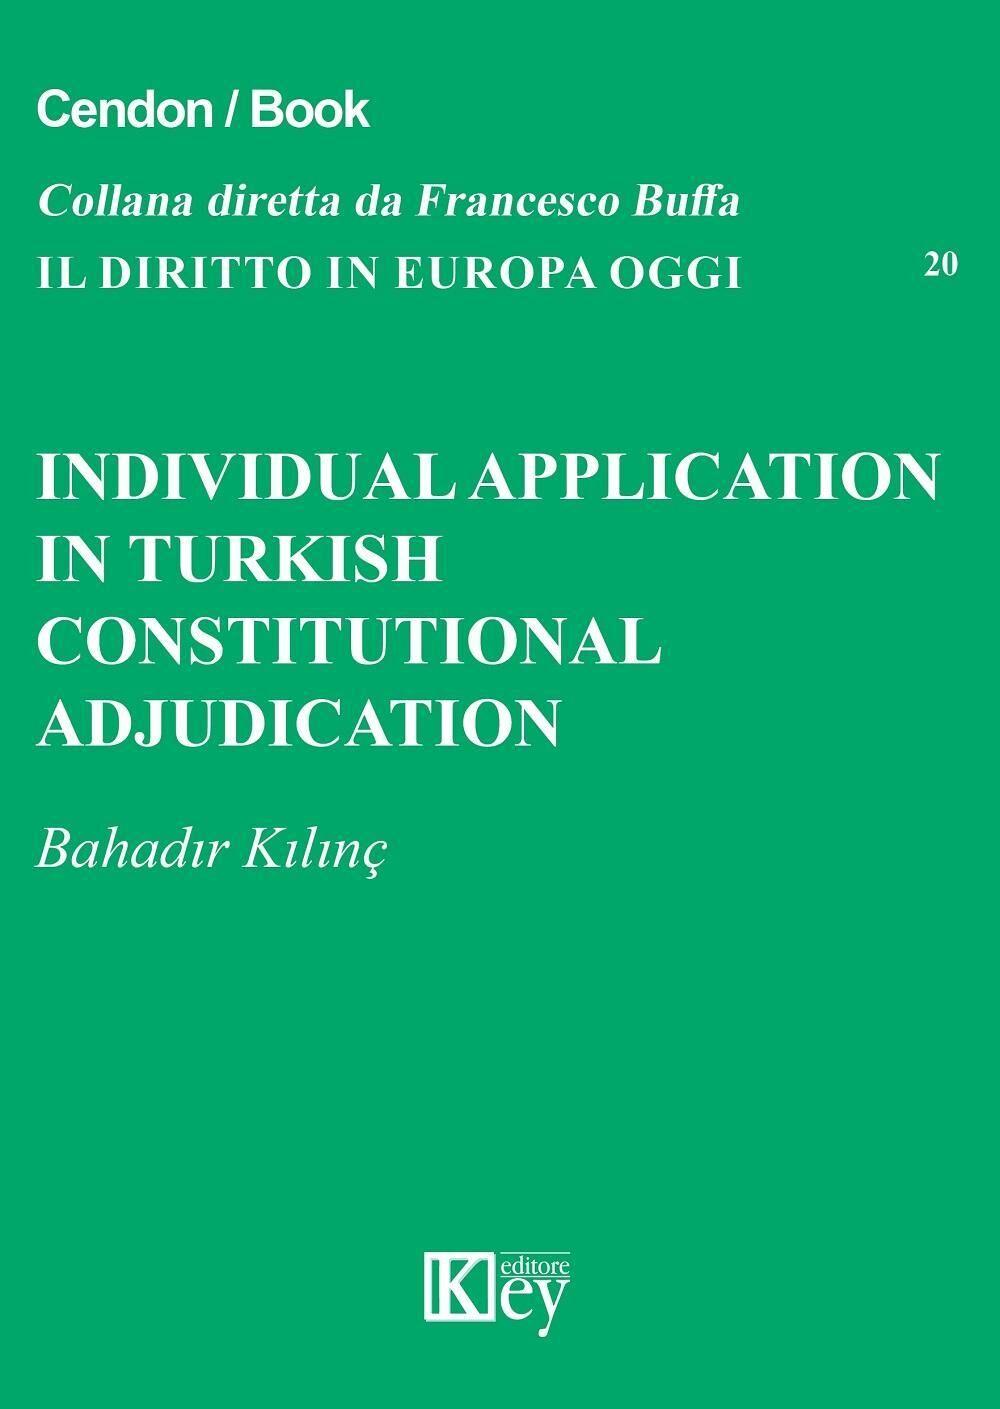 Individual application in Turkish constitutional adjudication court